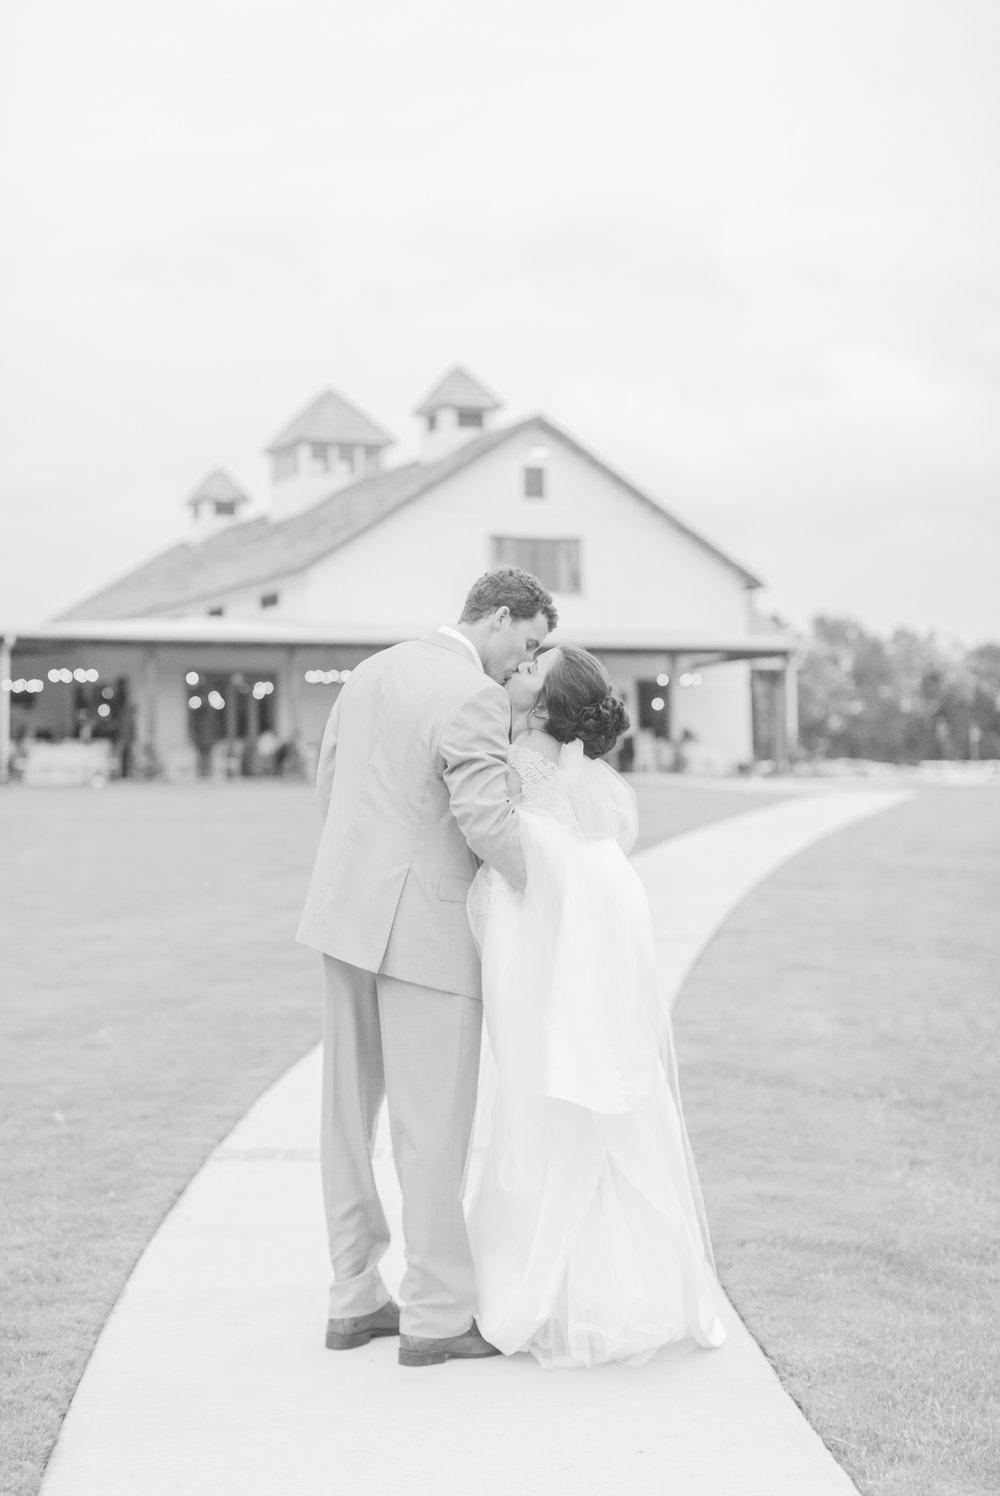 bridlewood-of-madison-mississippi-wedding 64.jpg